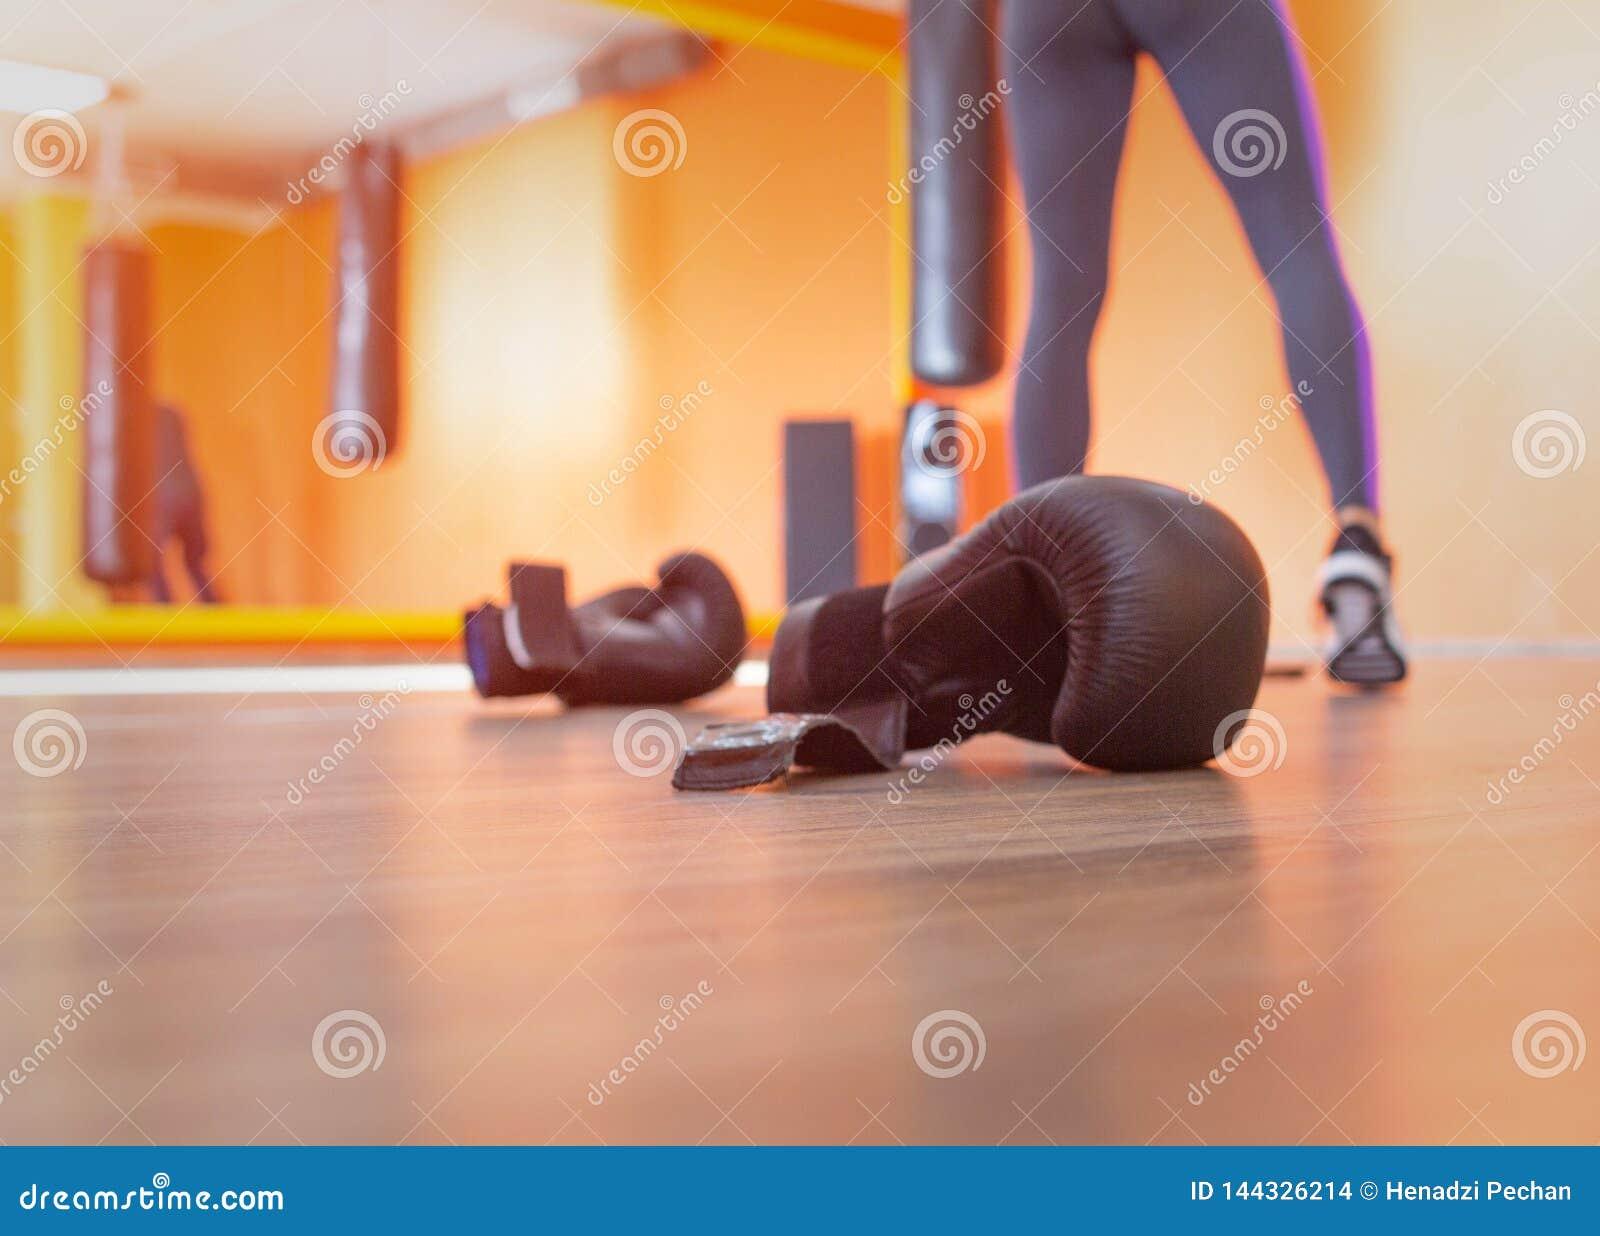 Kick Boxing Young Woman Royalty-Free Stock Photo ...